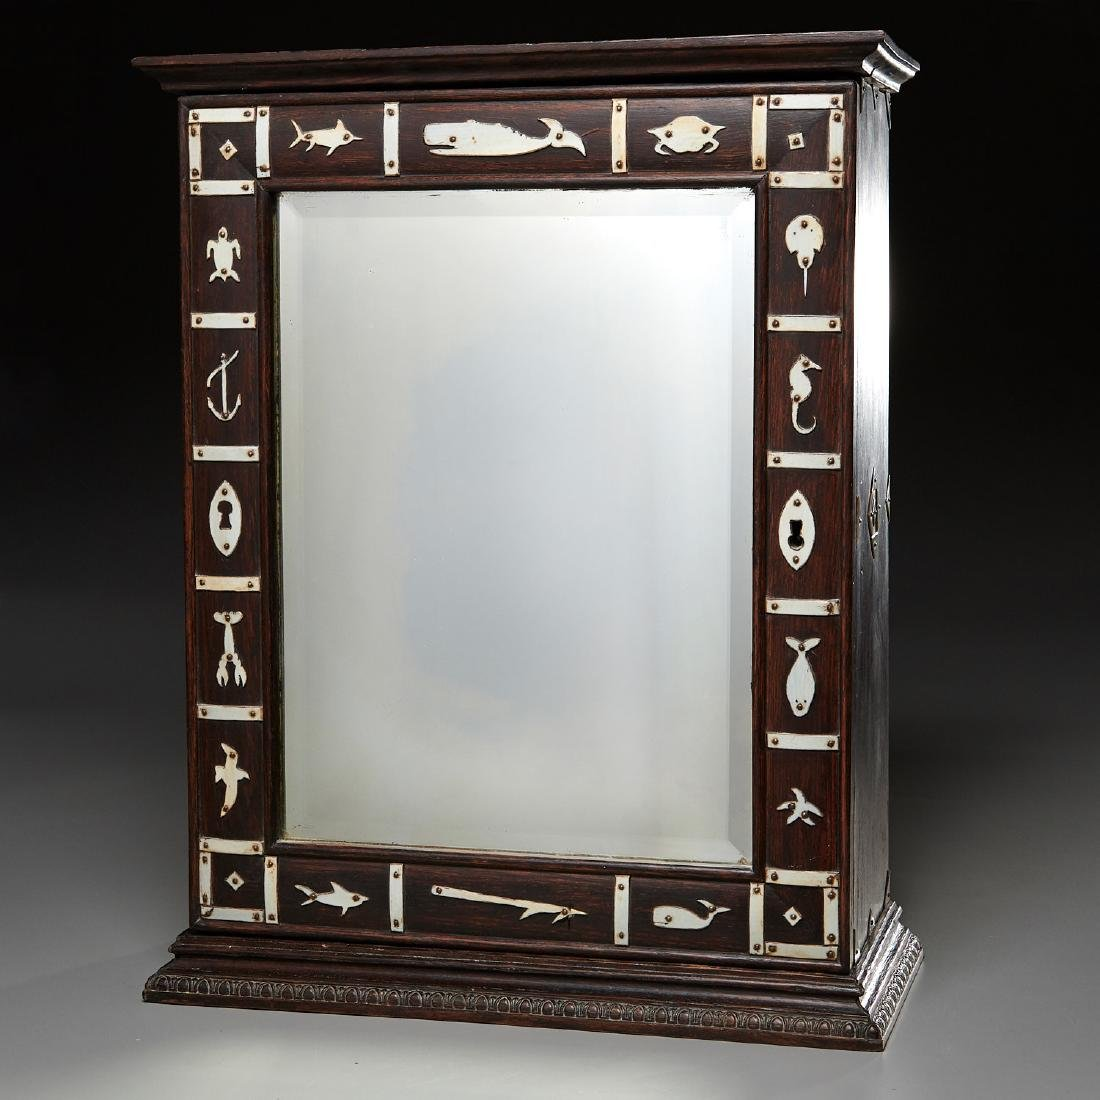 Nantucket style Folk Art apothecary cabinet